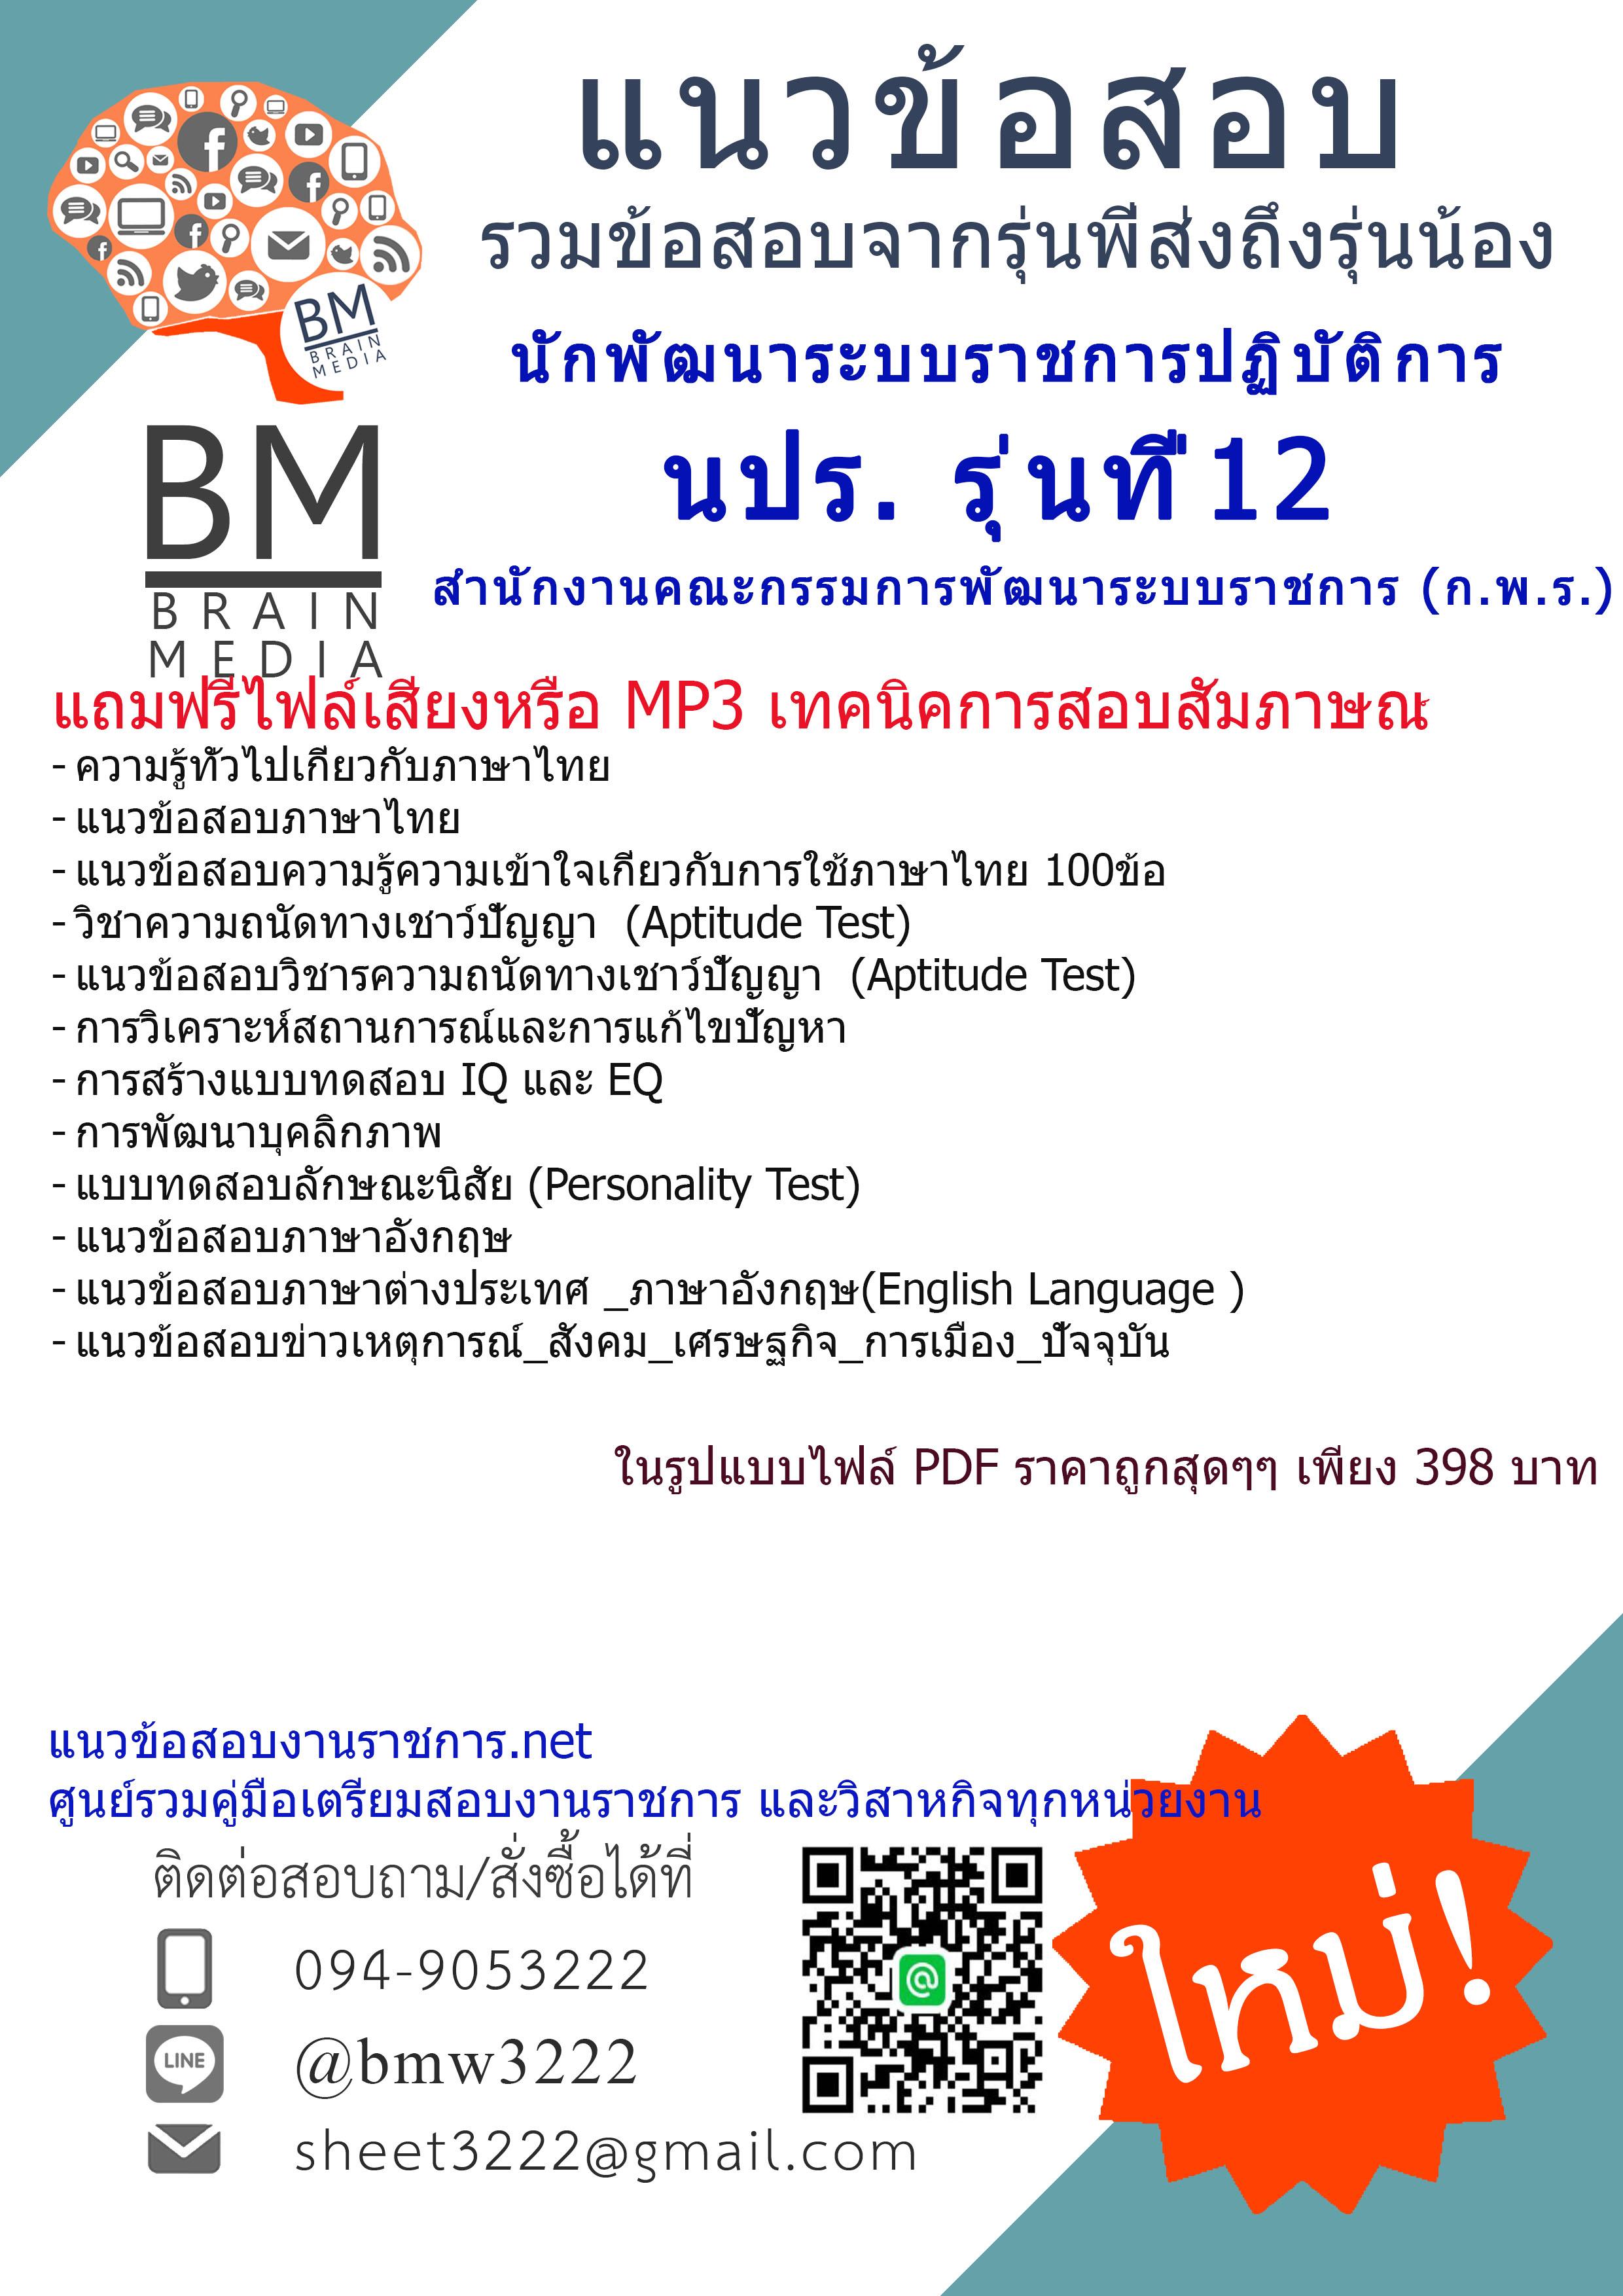 (((newupdateสุดๆ)))แนวข้อสอบนักพัฒนาระบบราชการปฏิบัติการ(นปร.)รุ่นที่12 สำนักงานคณะกรรมการพัฒนาระบบราชการ (ก.พ.ร.)